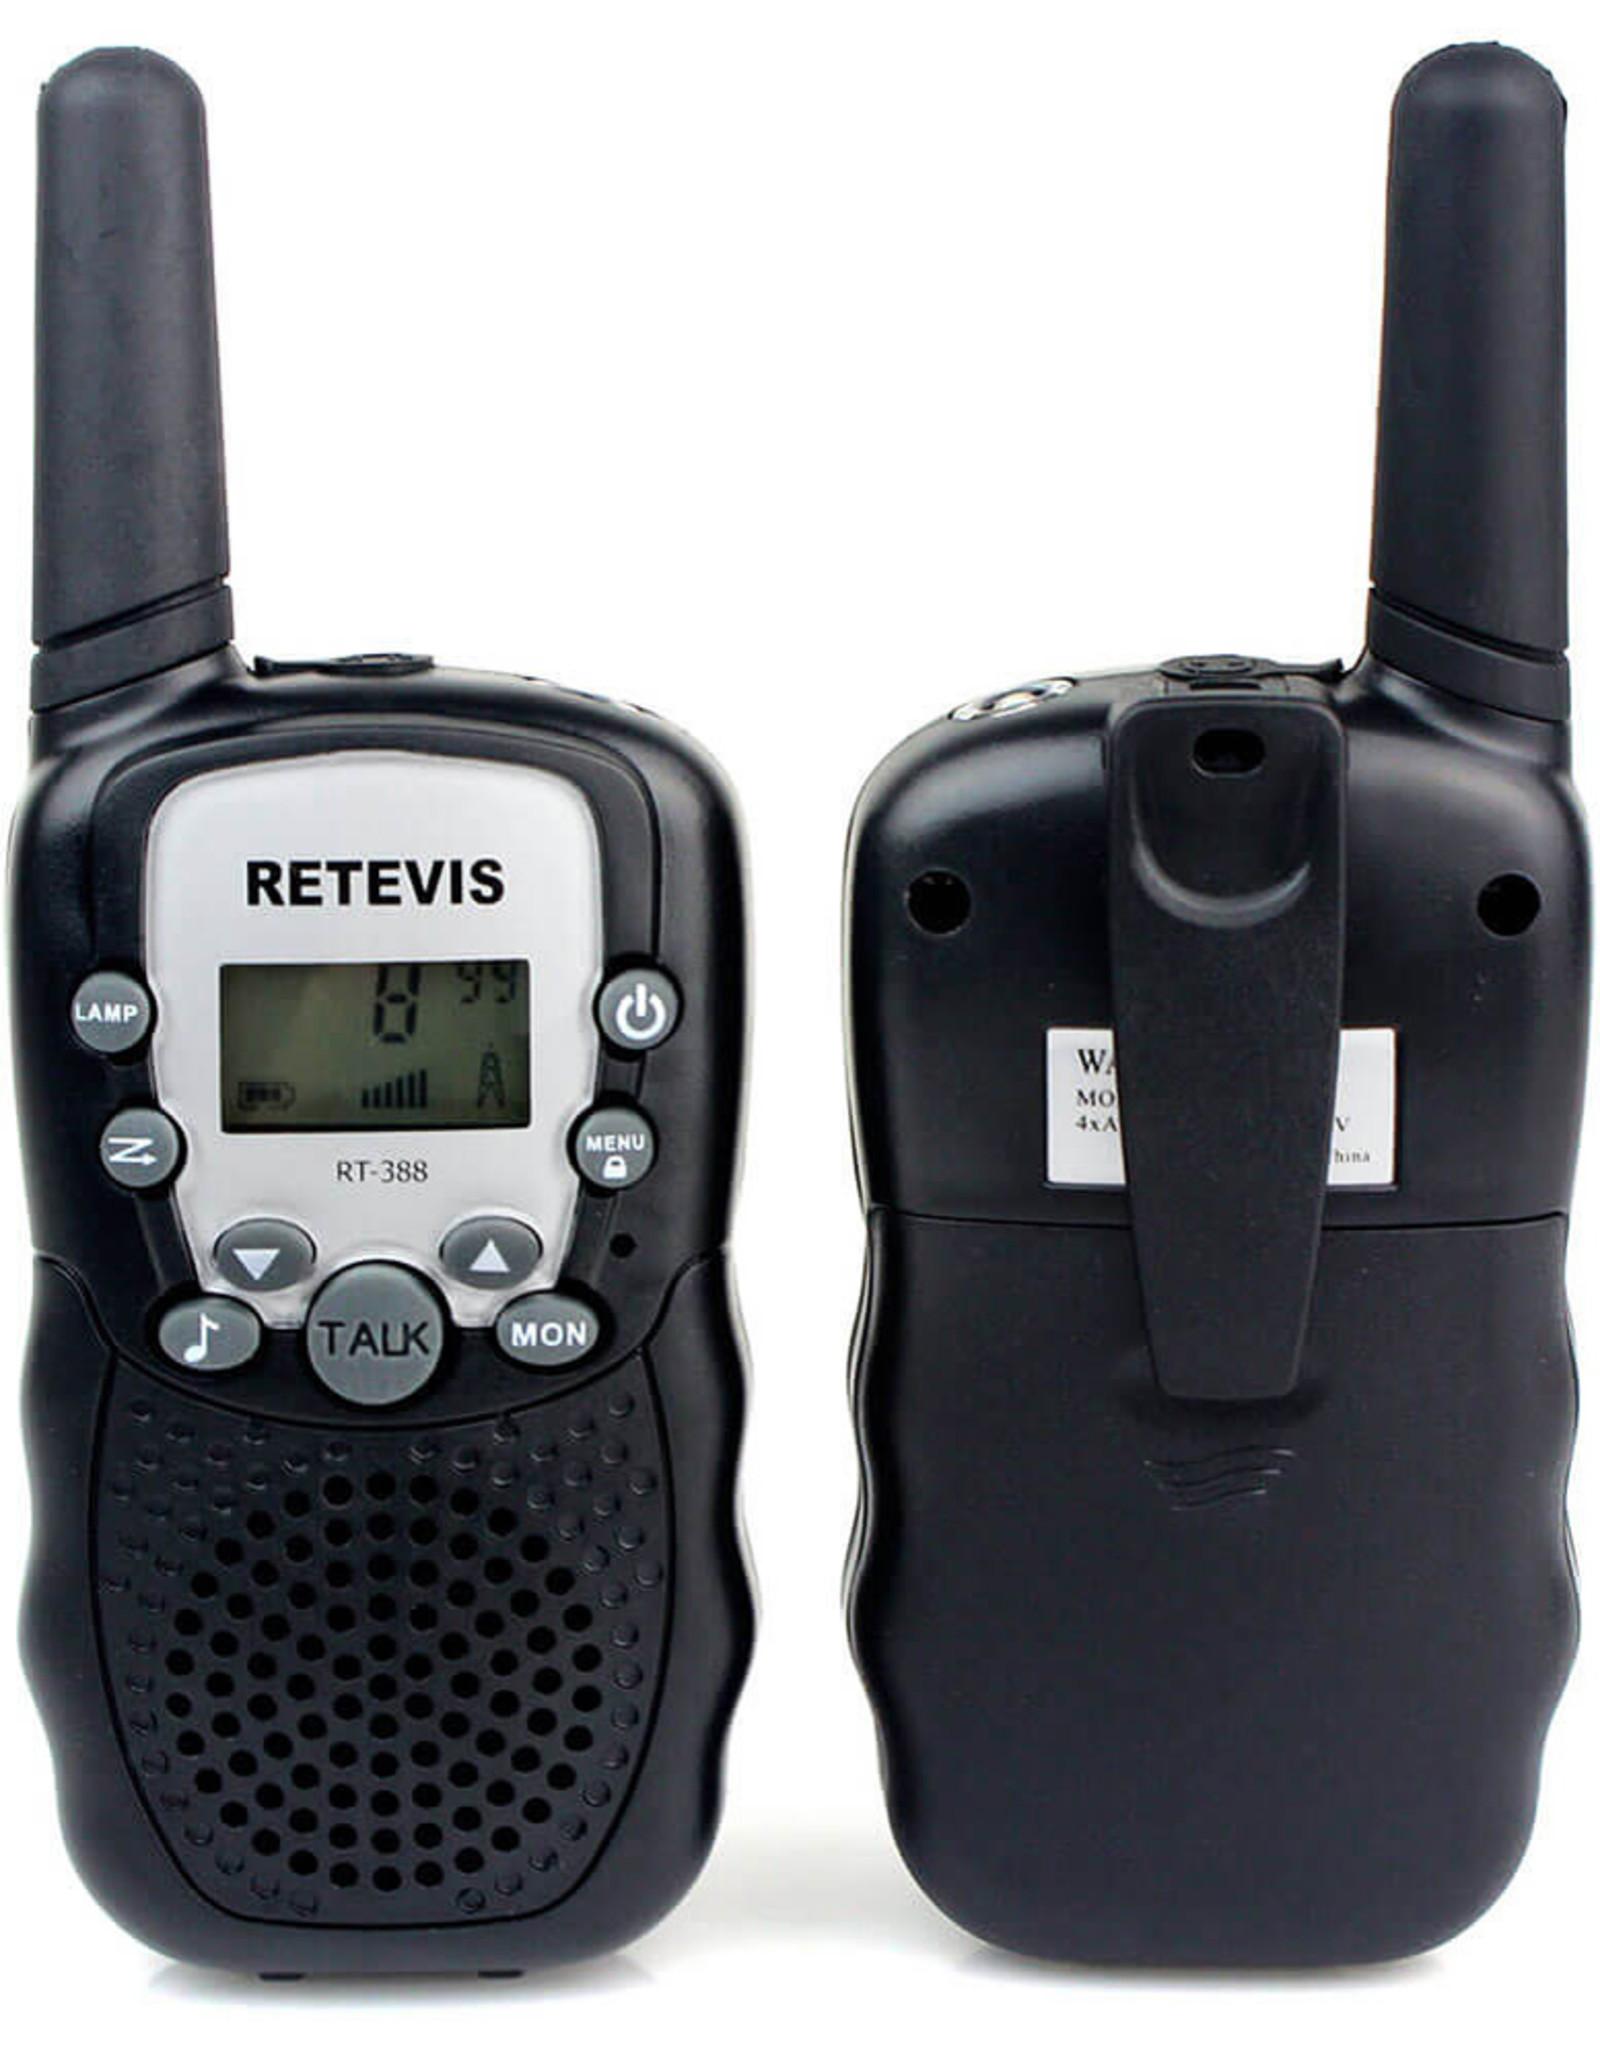 Retevis Walkie Talkies with Flashlight